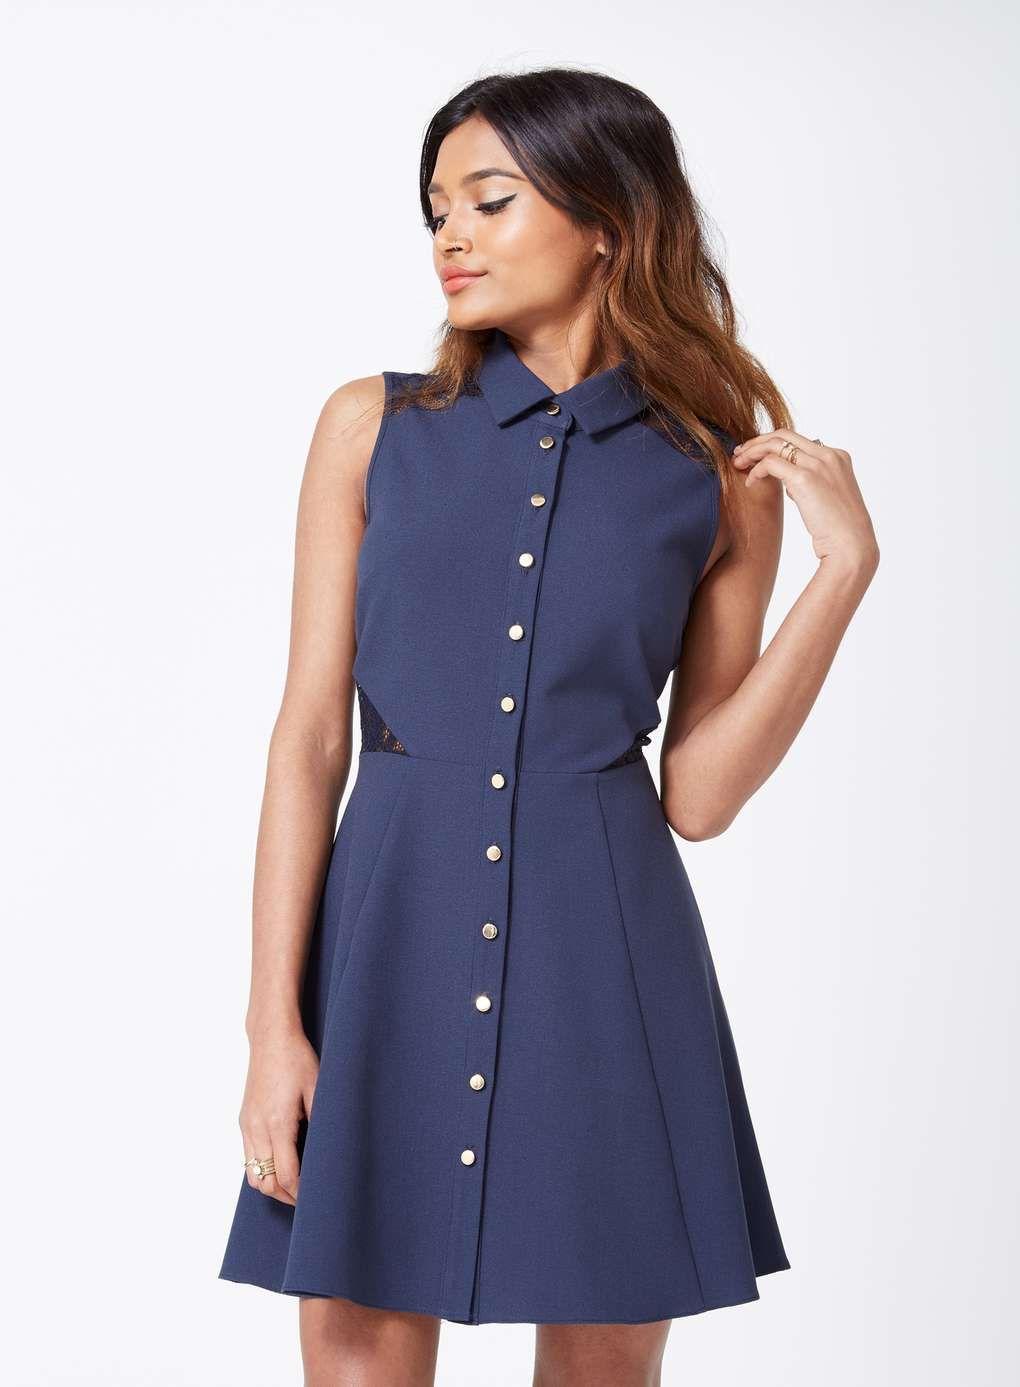 Lace dress navy  PETITE Navy Lace Shirt Dress  View All  Petites  Dresses